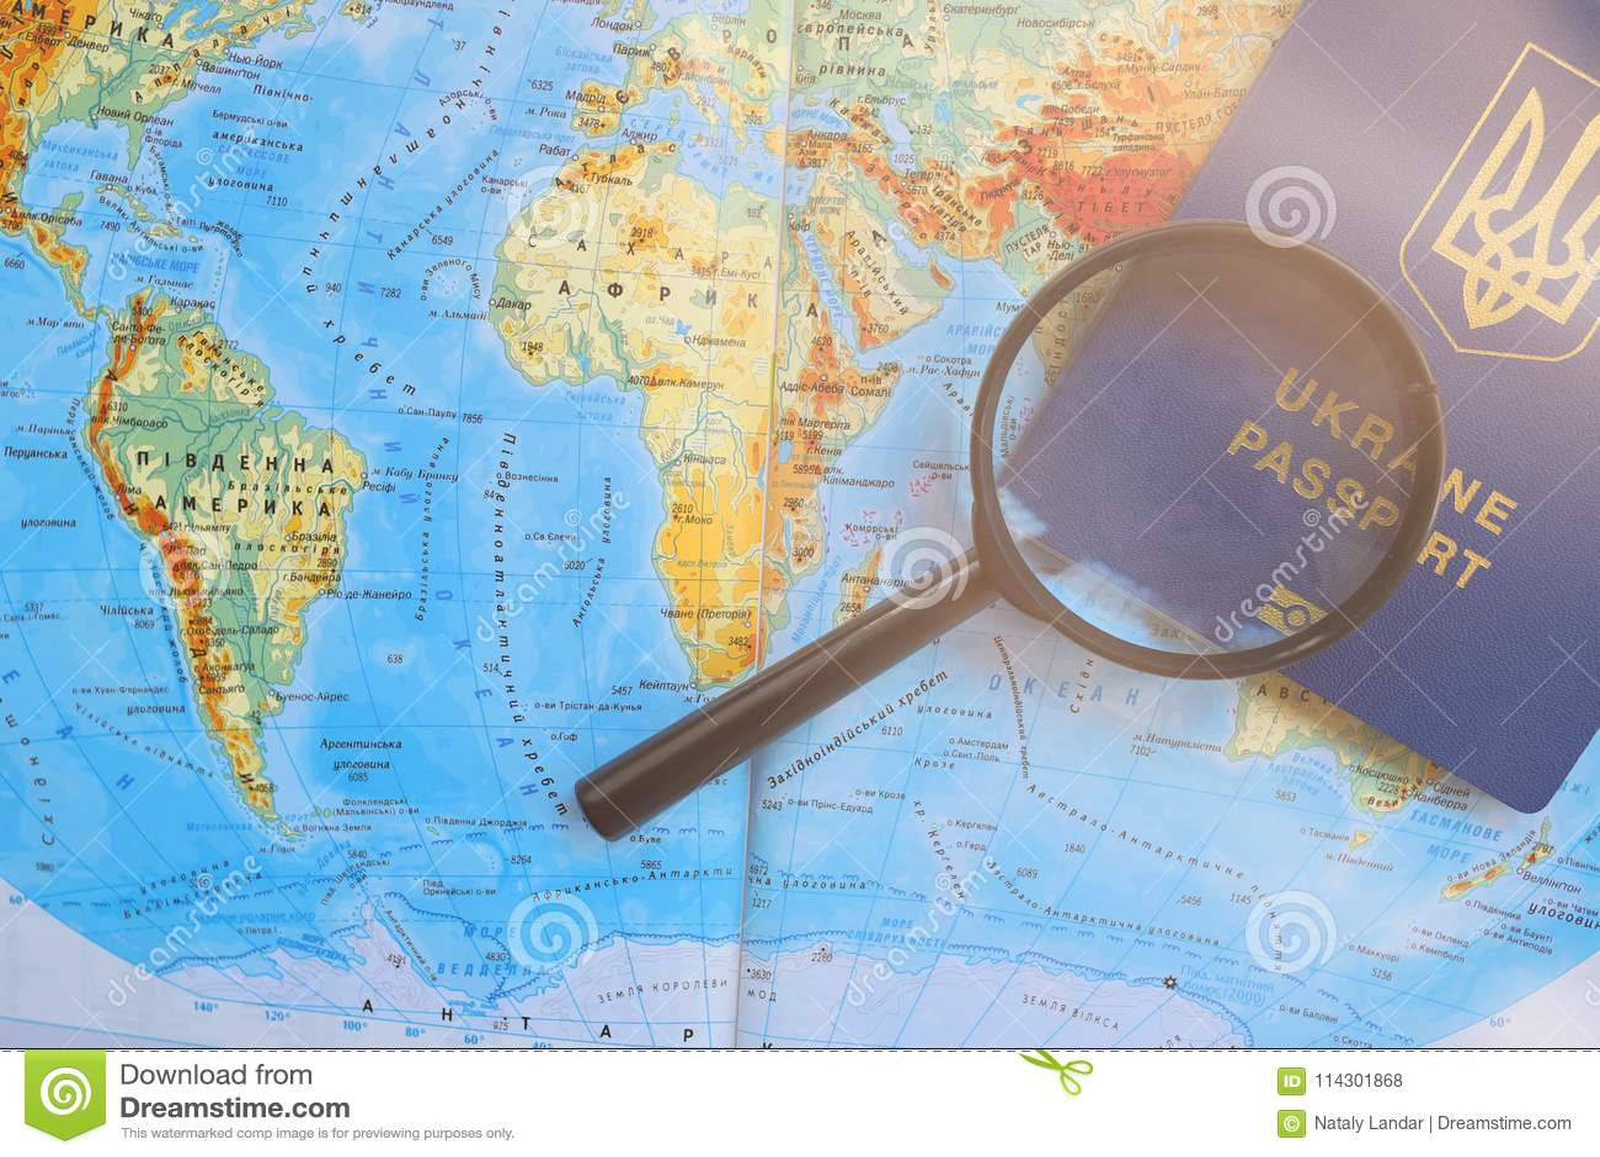 Passport On A Travel Worldwide Map. Planning Vacation. Stock Photo ...